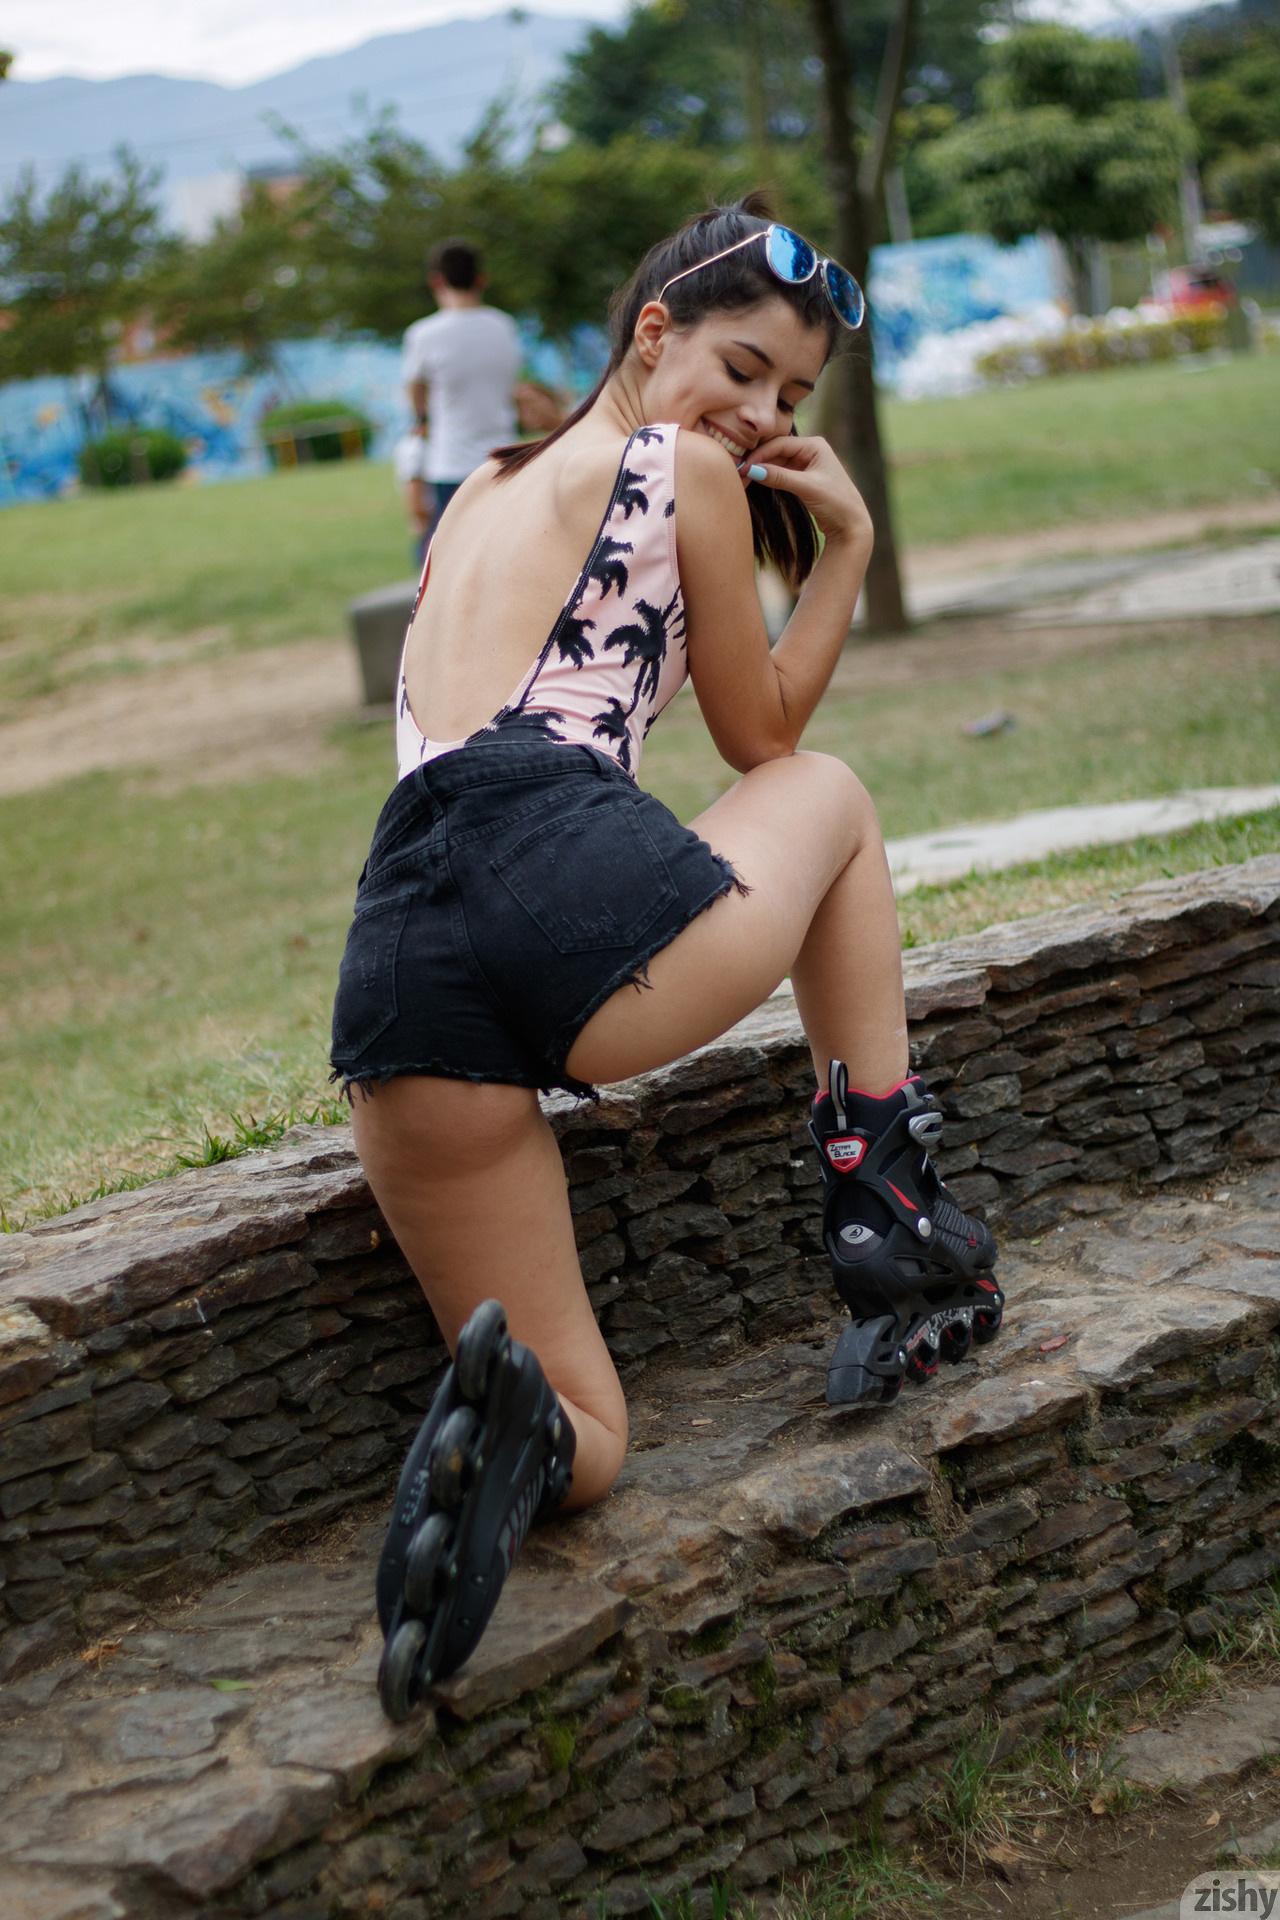 Kate Maze Skates Colombia Zishy (29)